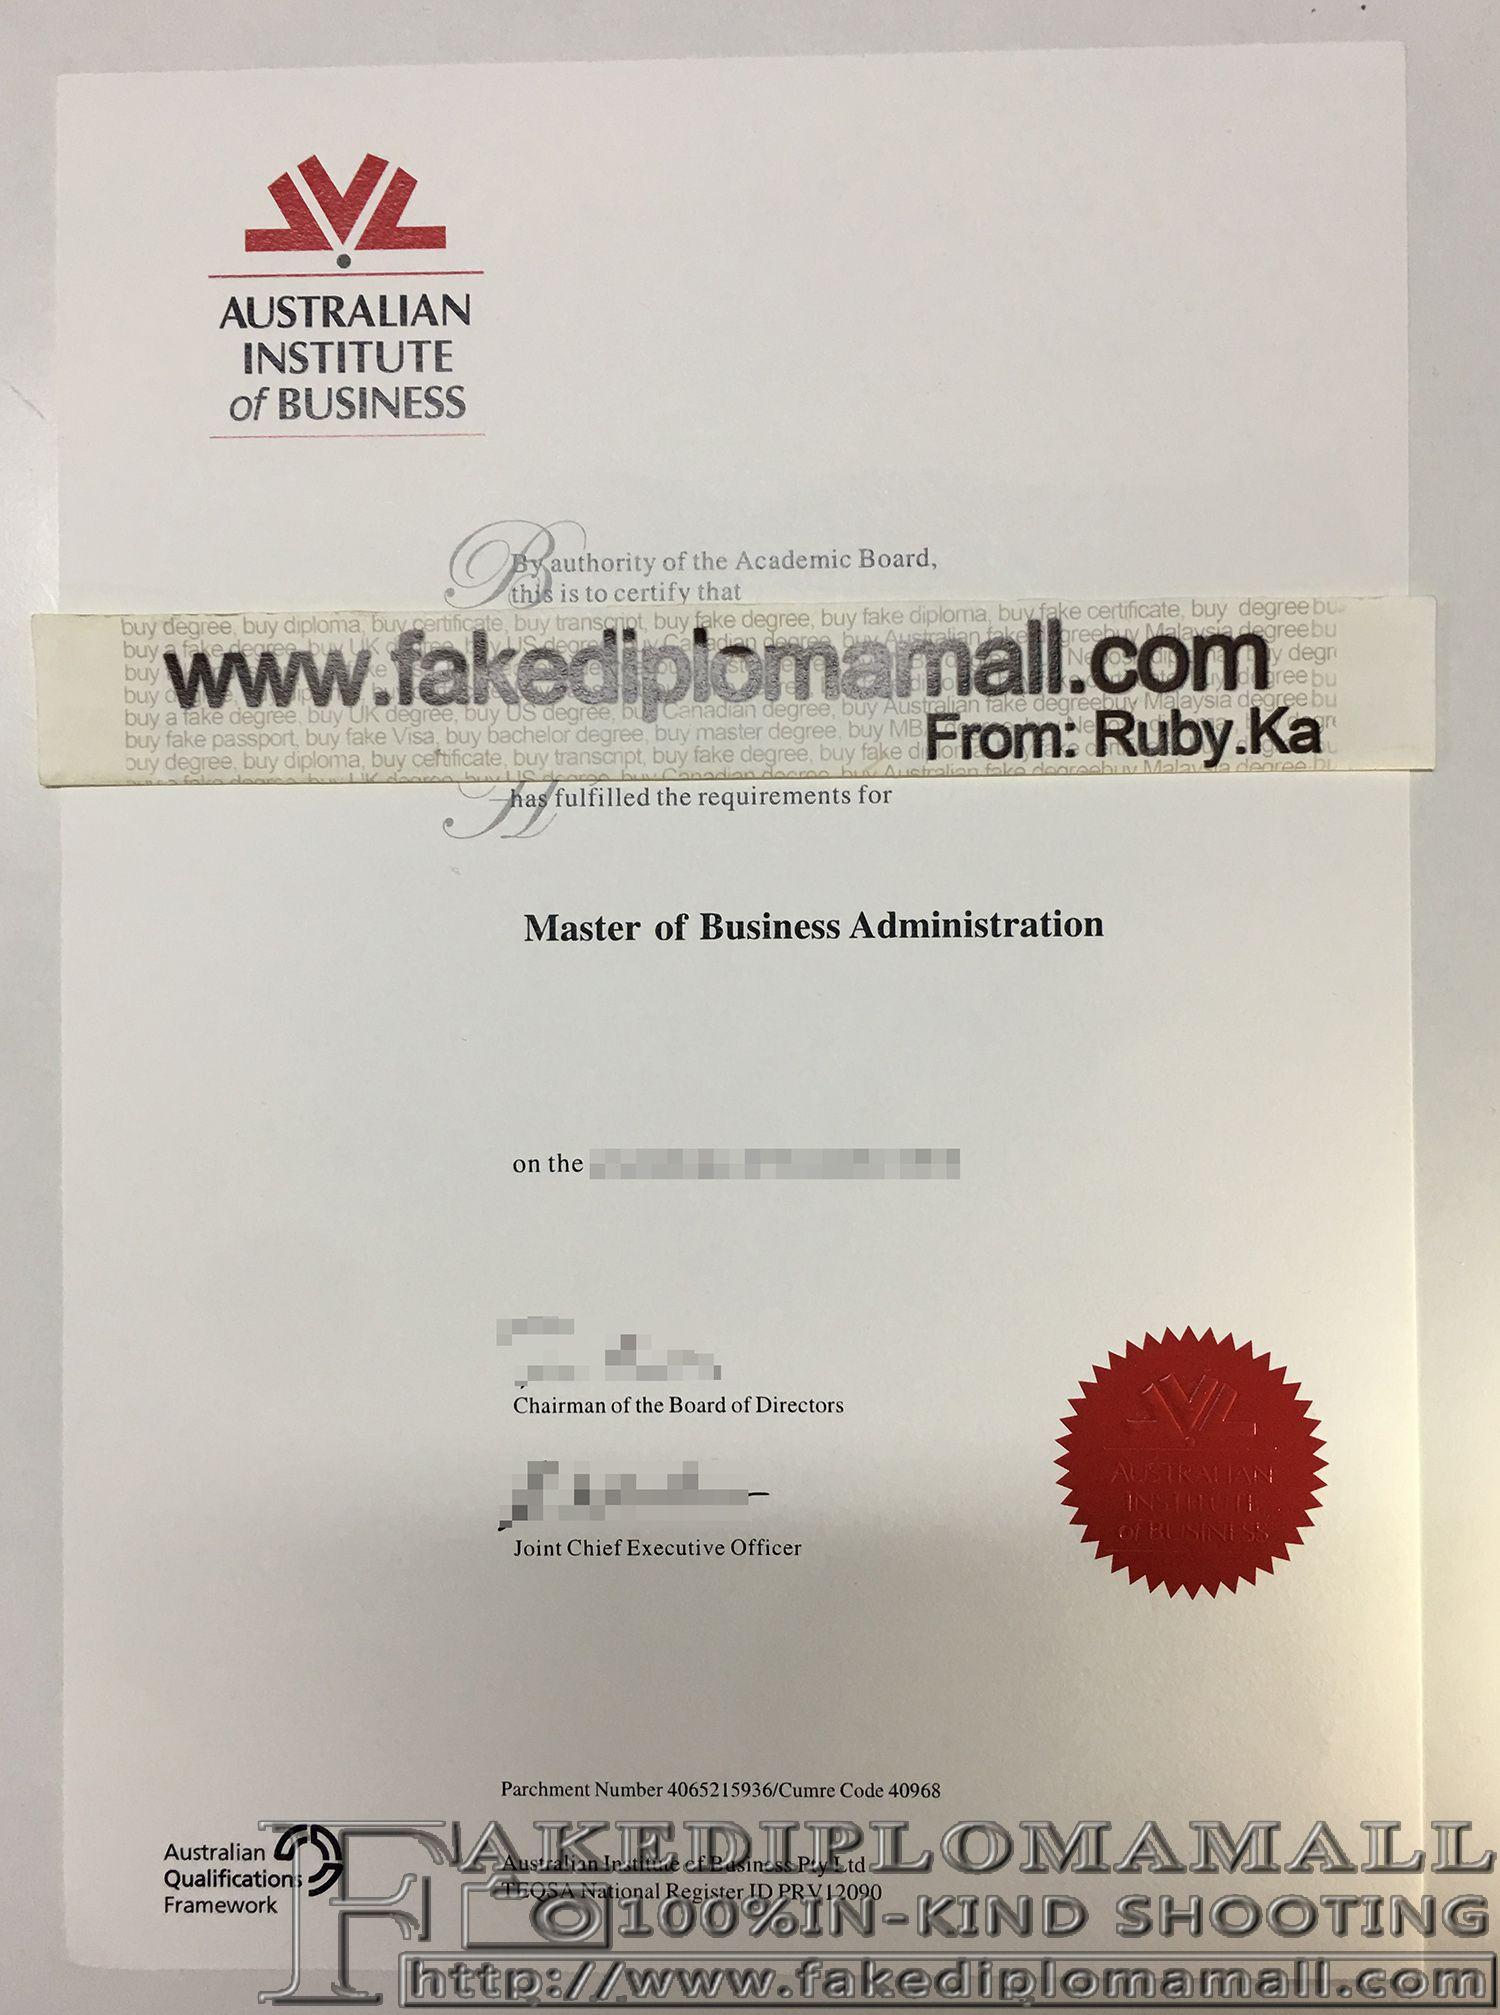 Australian Institute of Business MBA degree fake